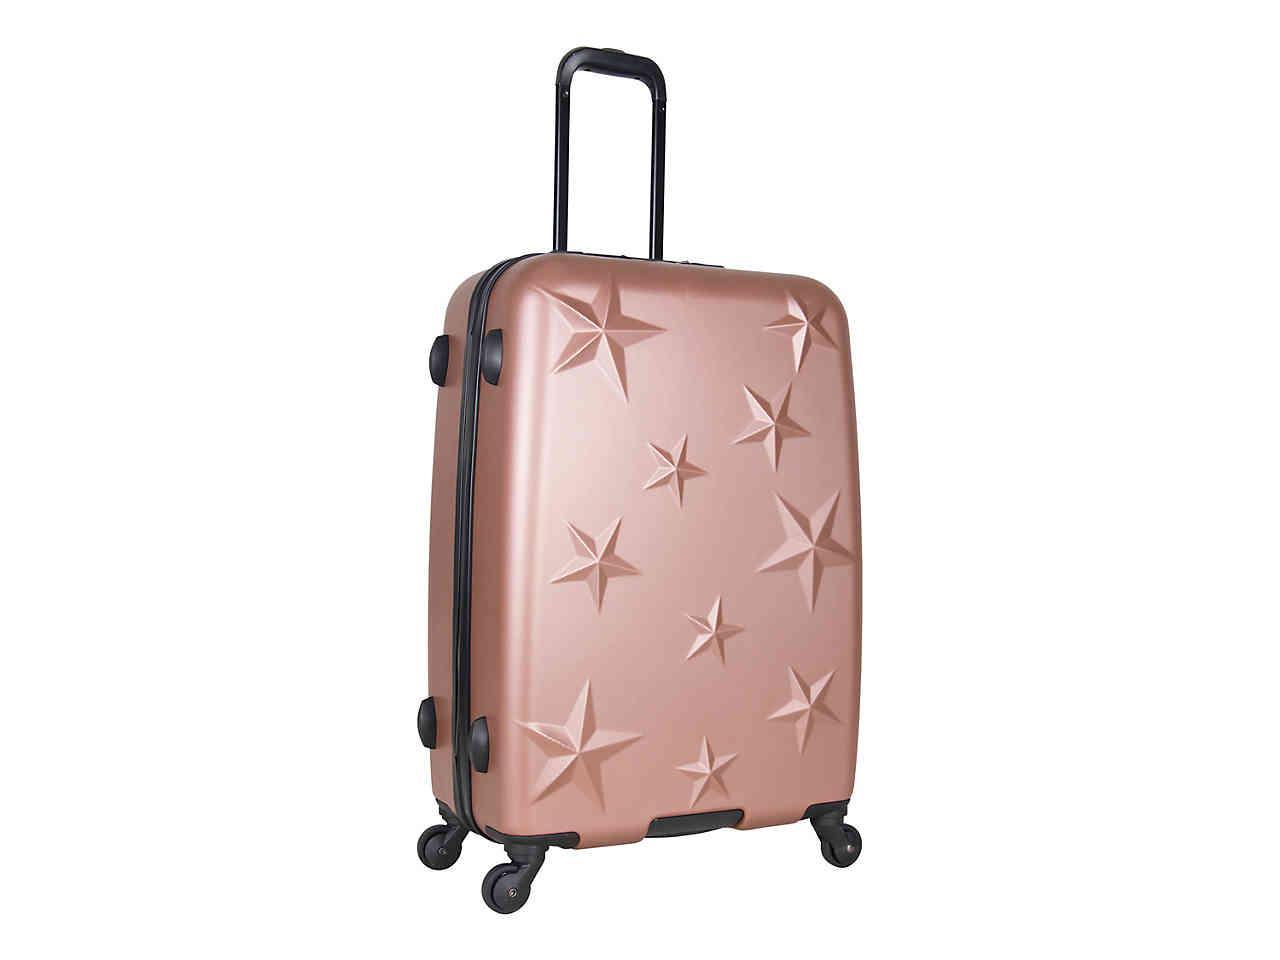 a8fc05f2f Aimee Kestenberg Star Molded 24-inch Checked Hard Shell Luggage in ...